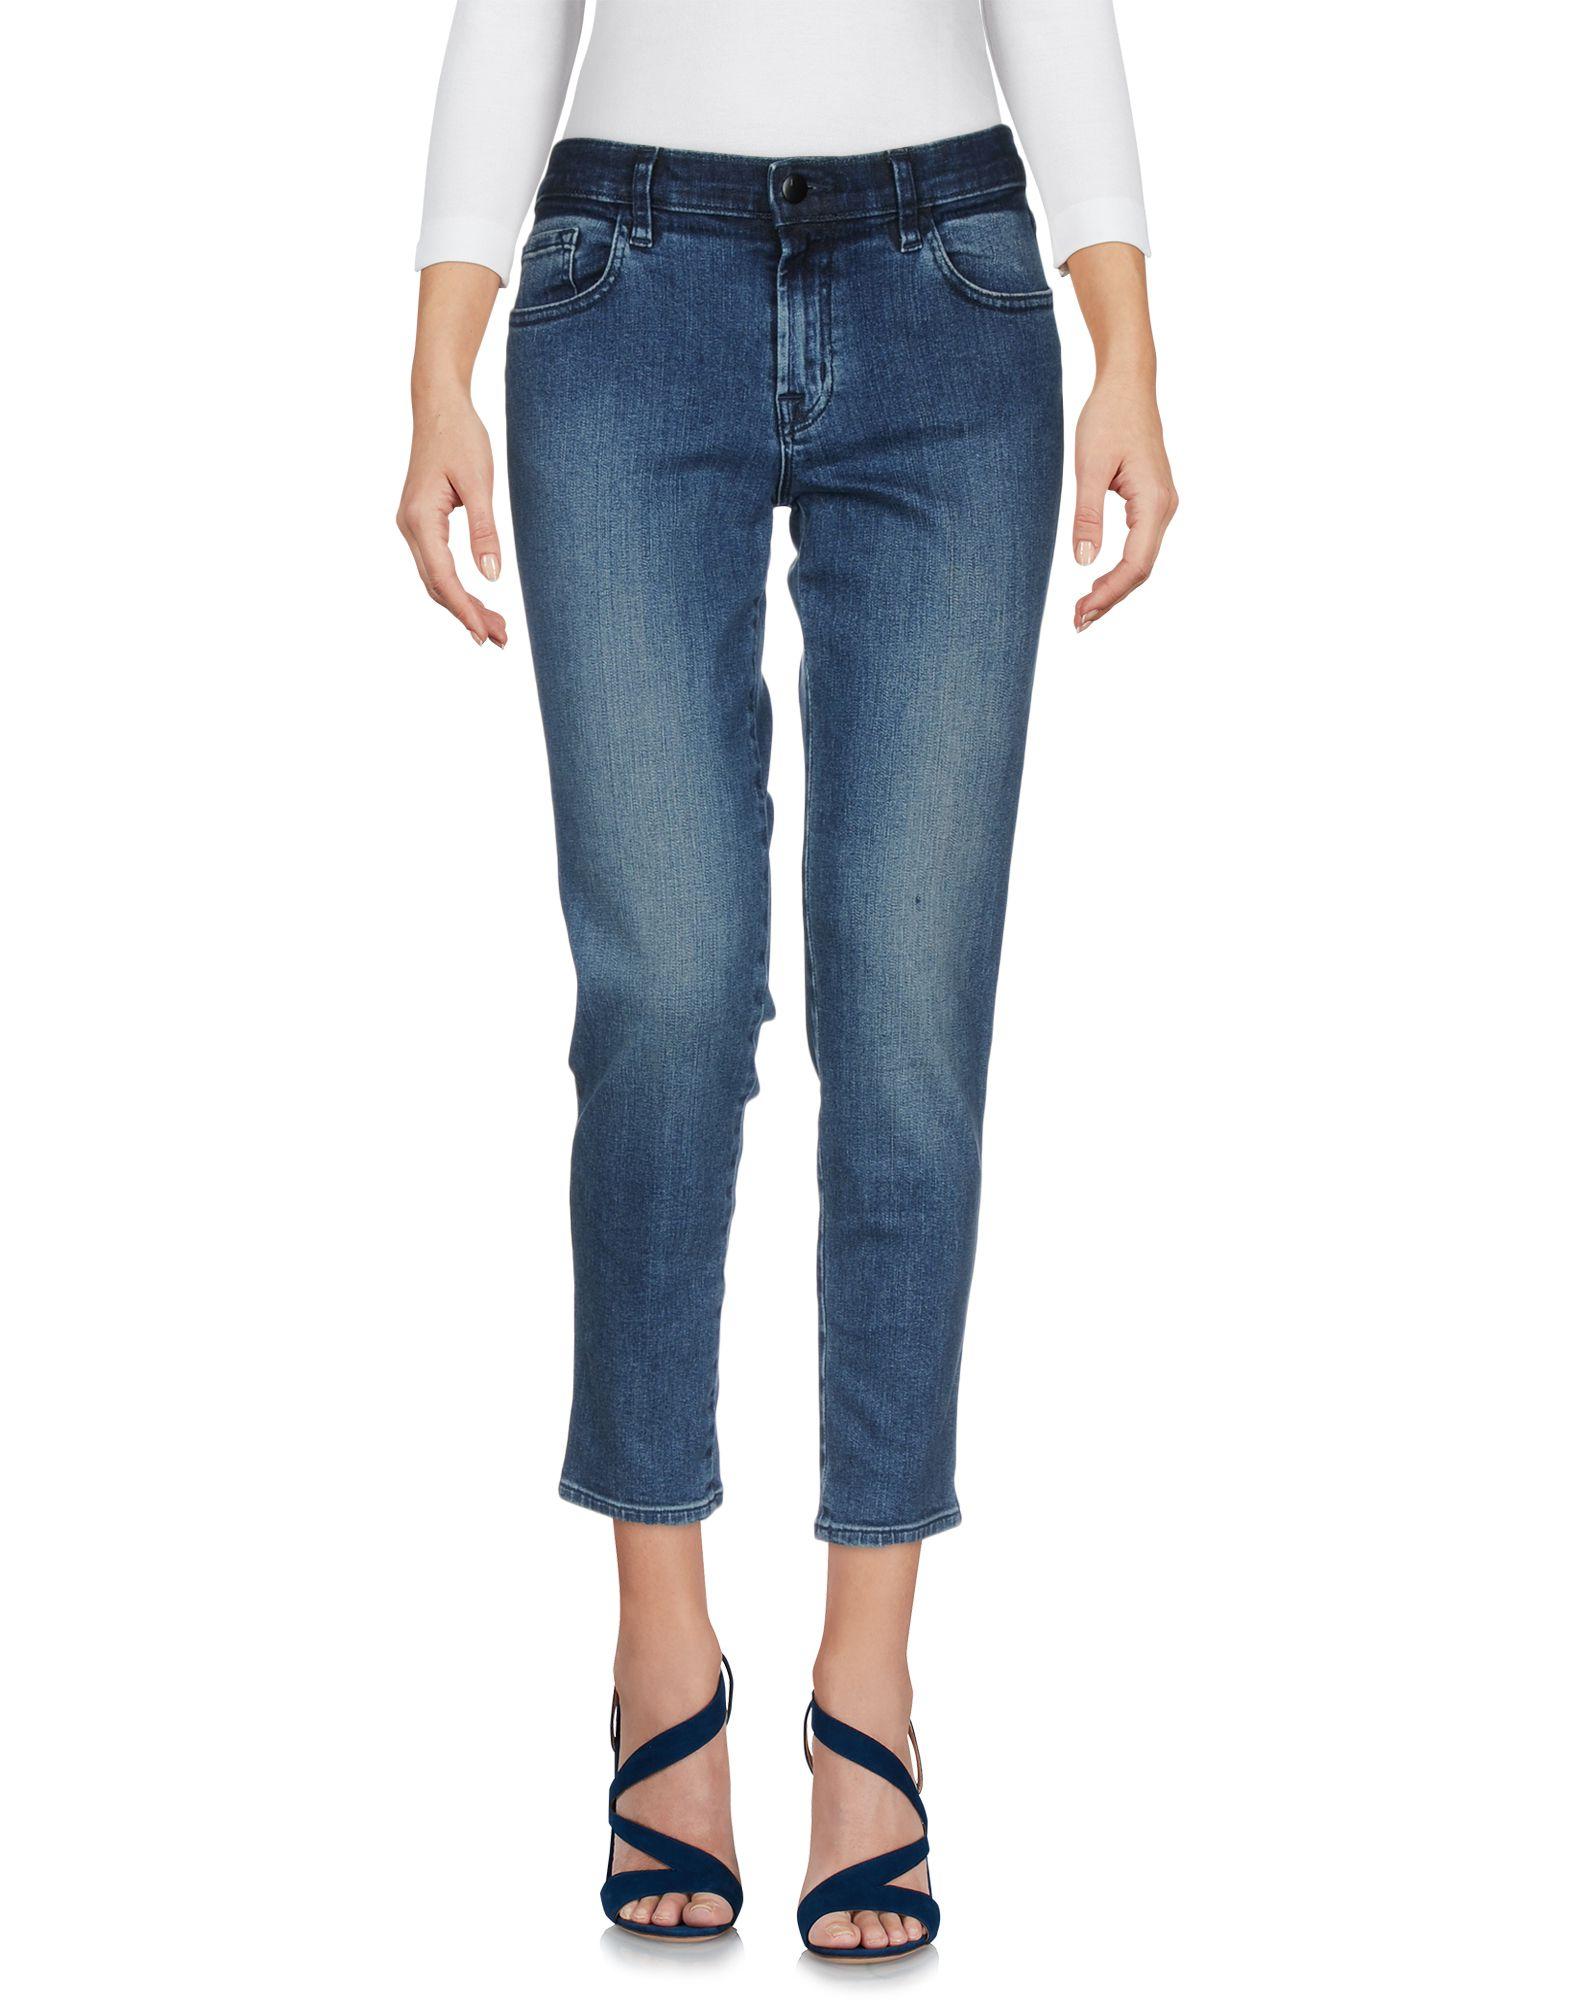 Pantaloni Jeans J Brand Donna - Acquista online su ncRy2